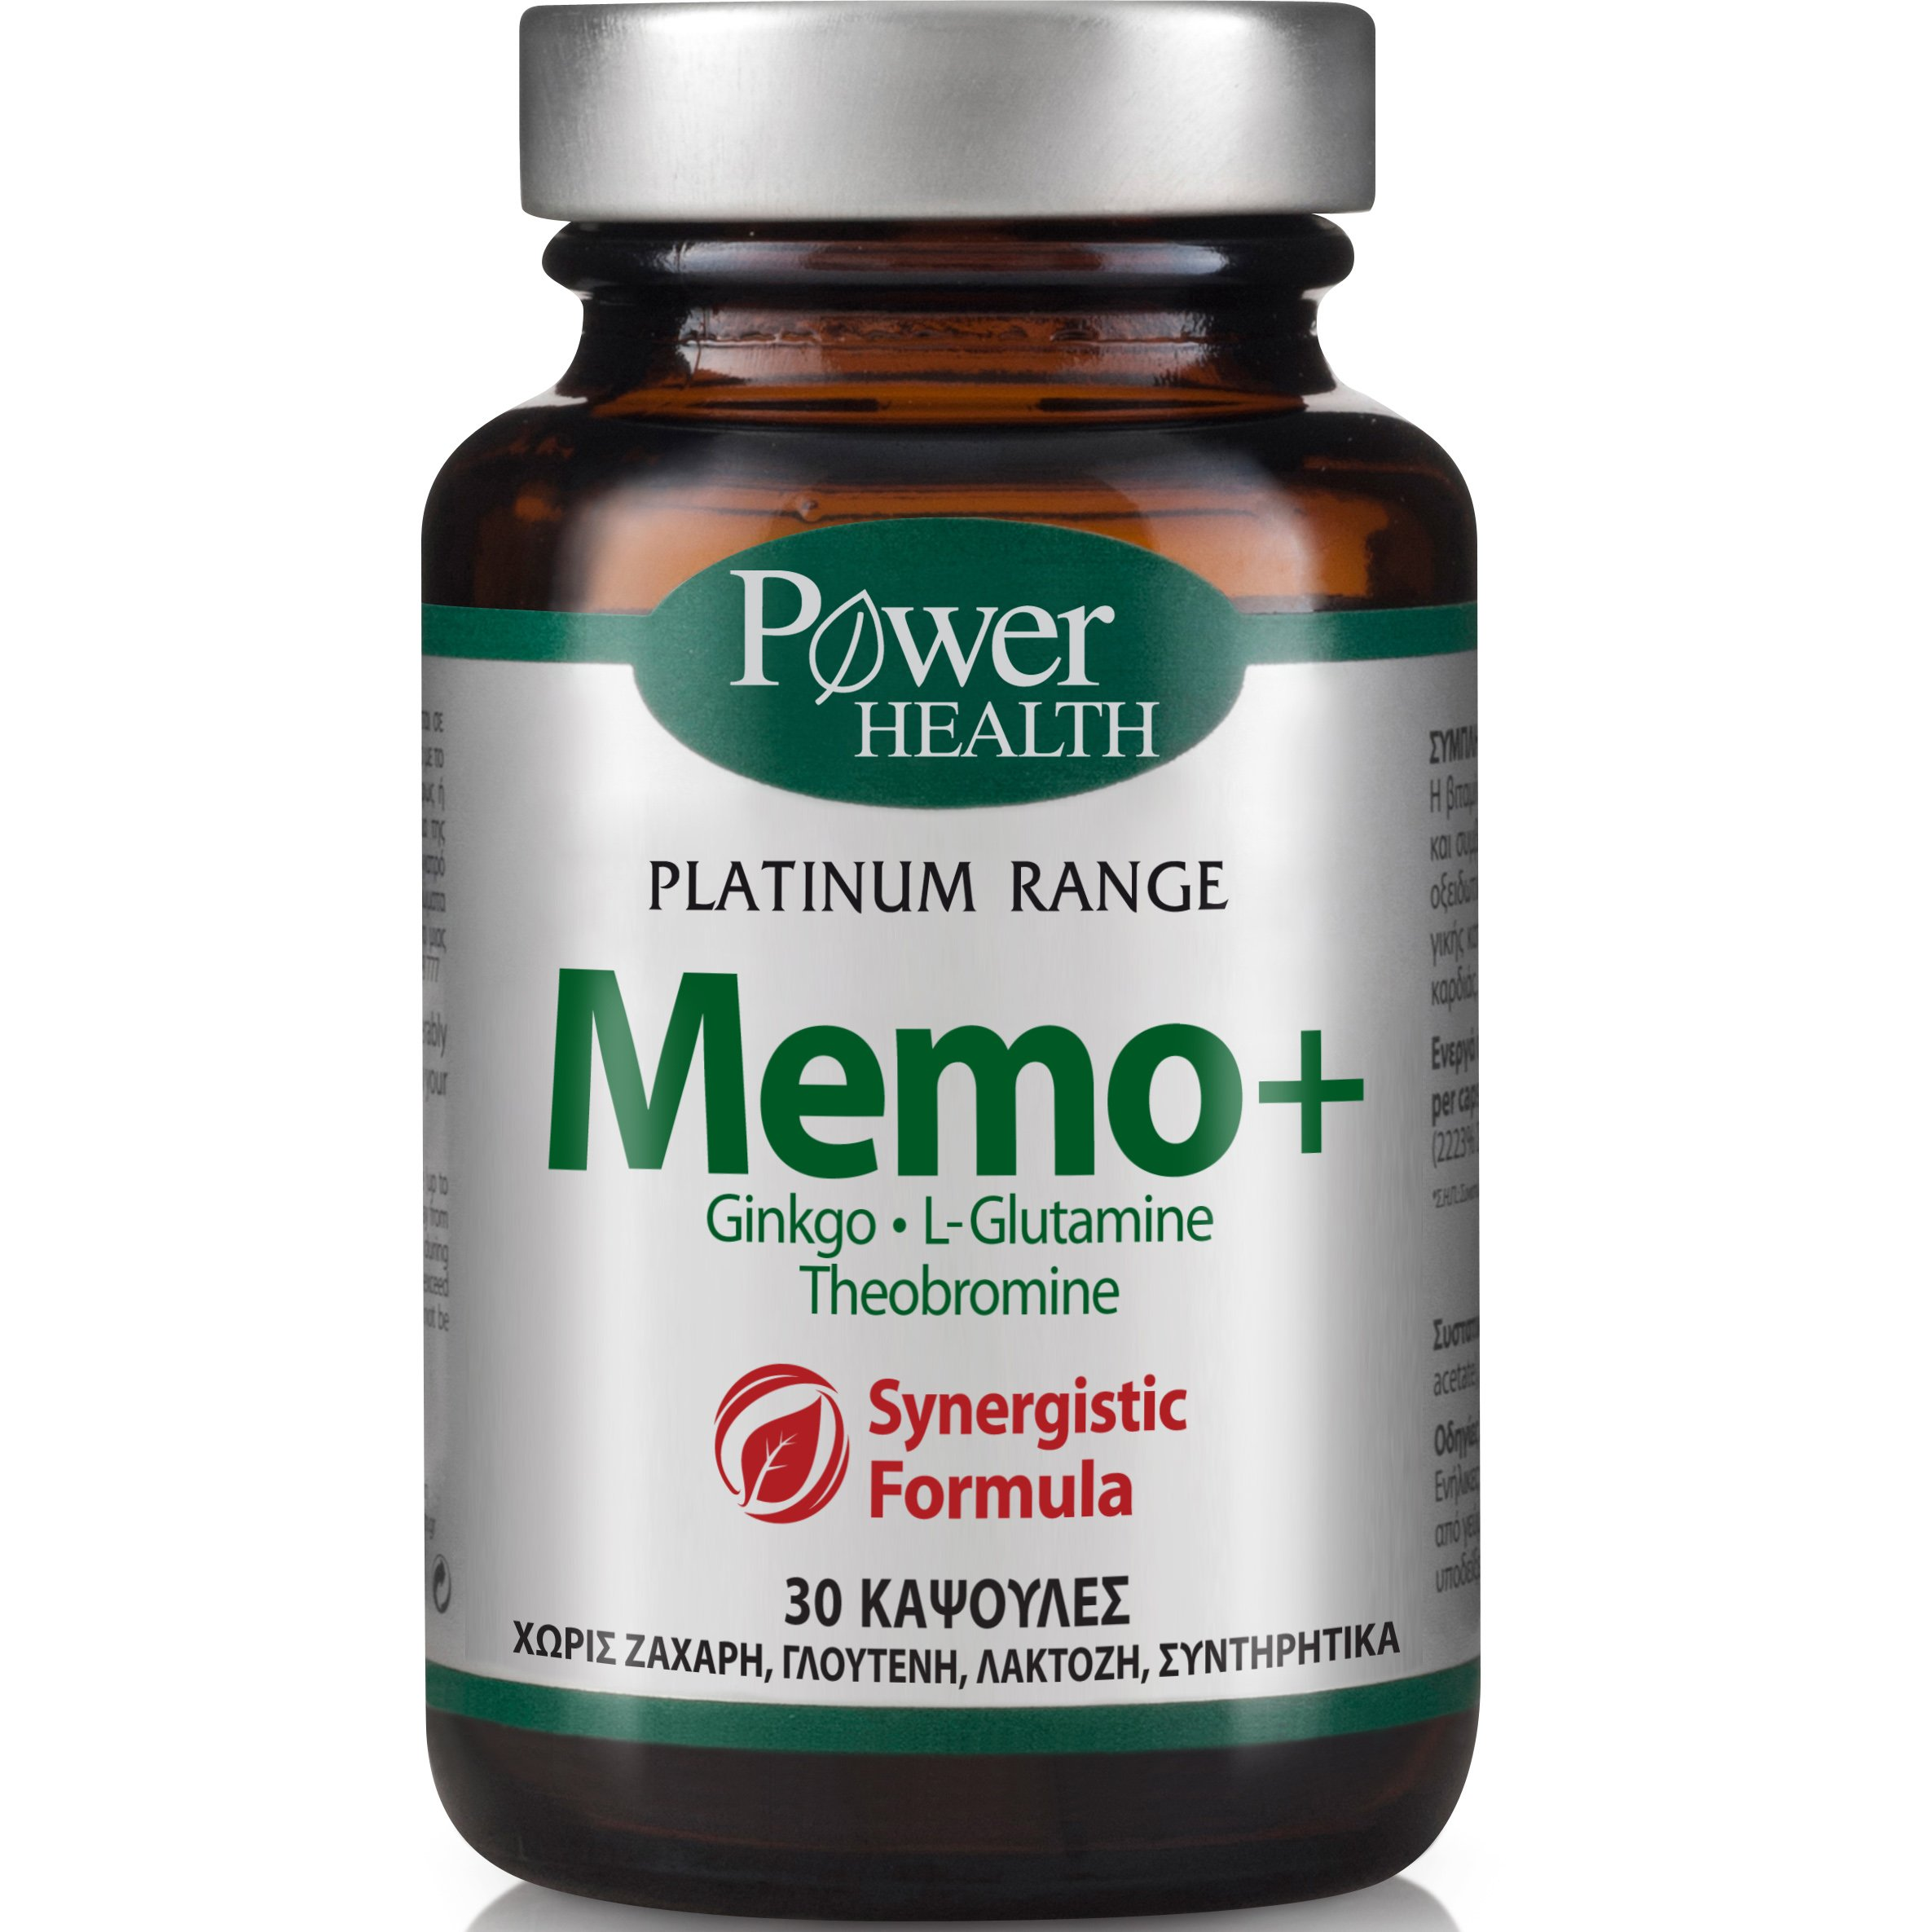 Power Health Platinum Memo+ Συμπλήρωμα Διατροφής για την Ενίσχυση της Μνήμης &της Πνευματικής Ενέργειας30caps